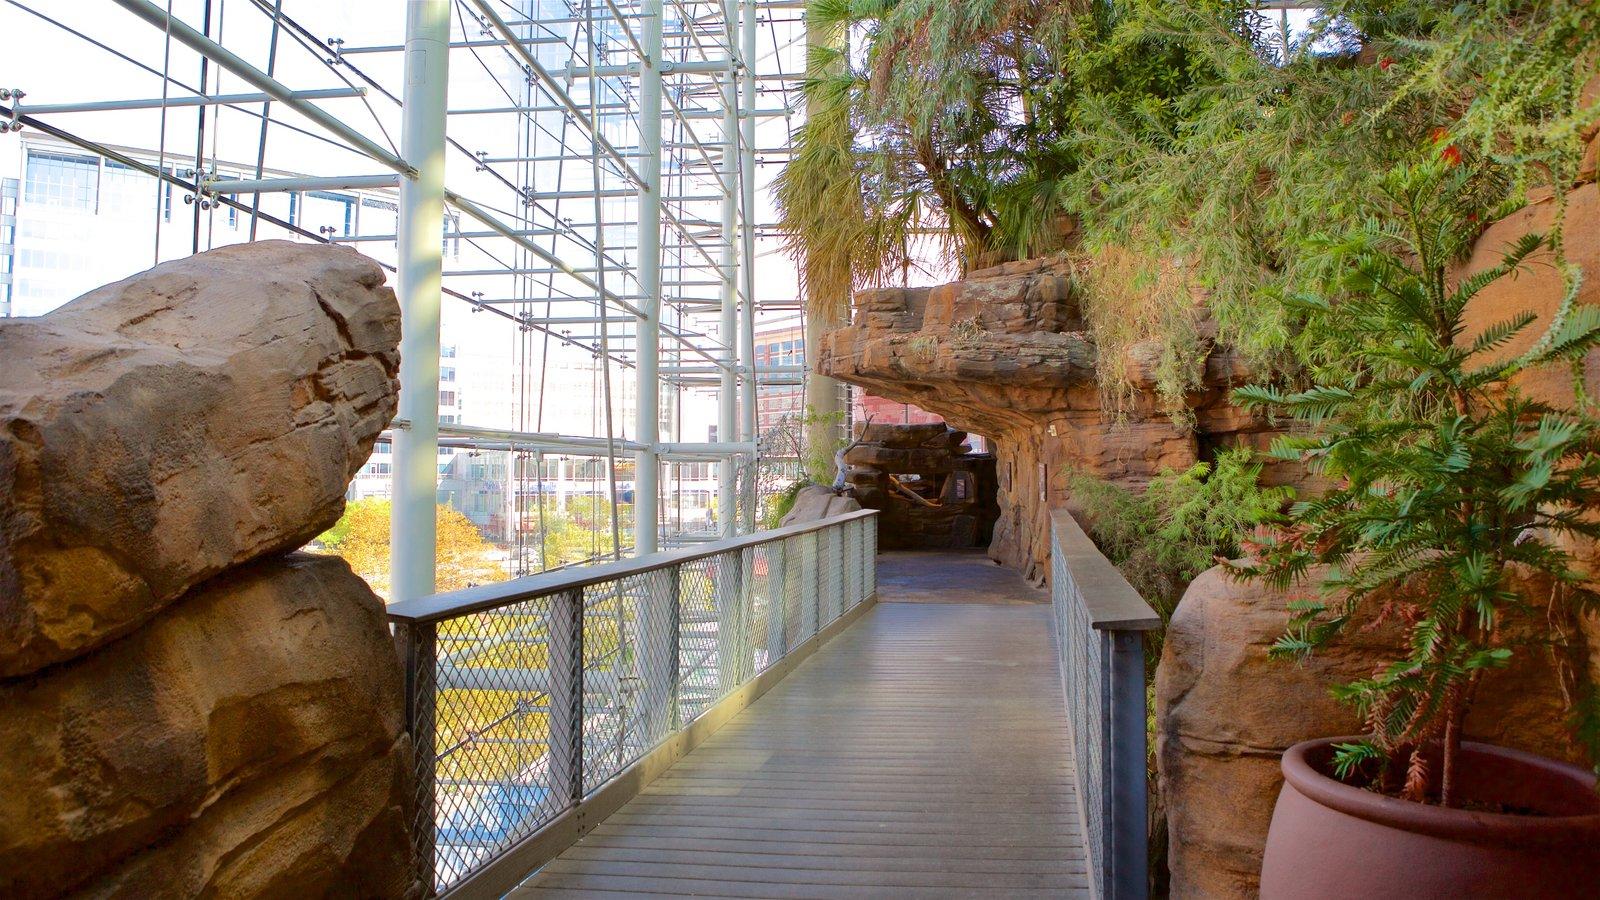 National Aquarium in Baltimore showing interior views and a garden